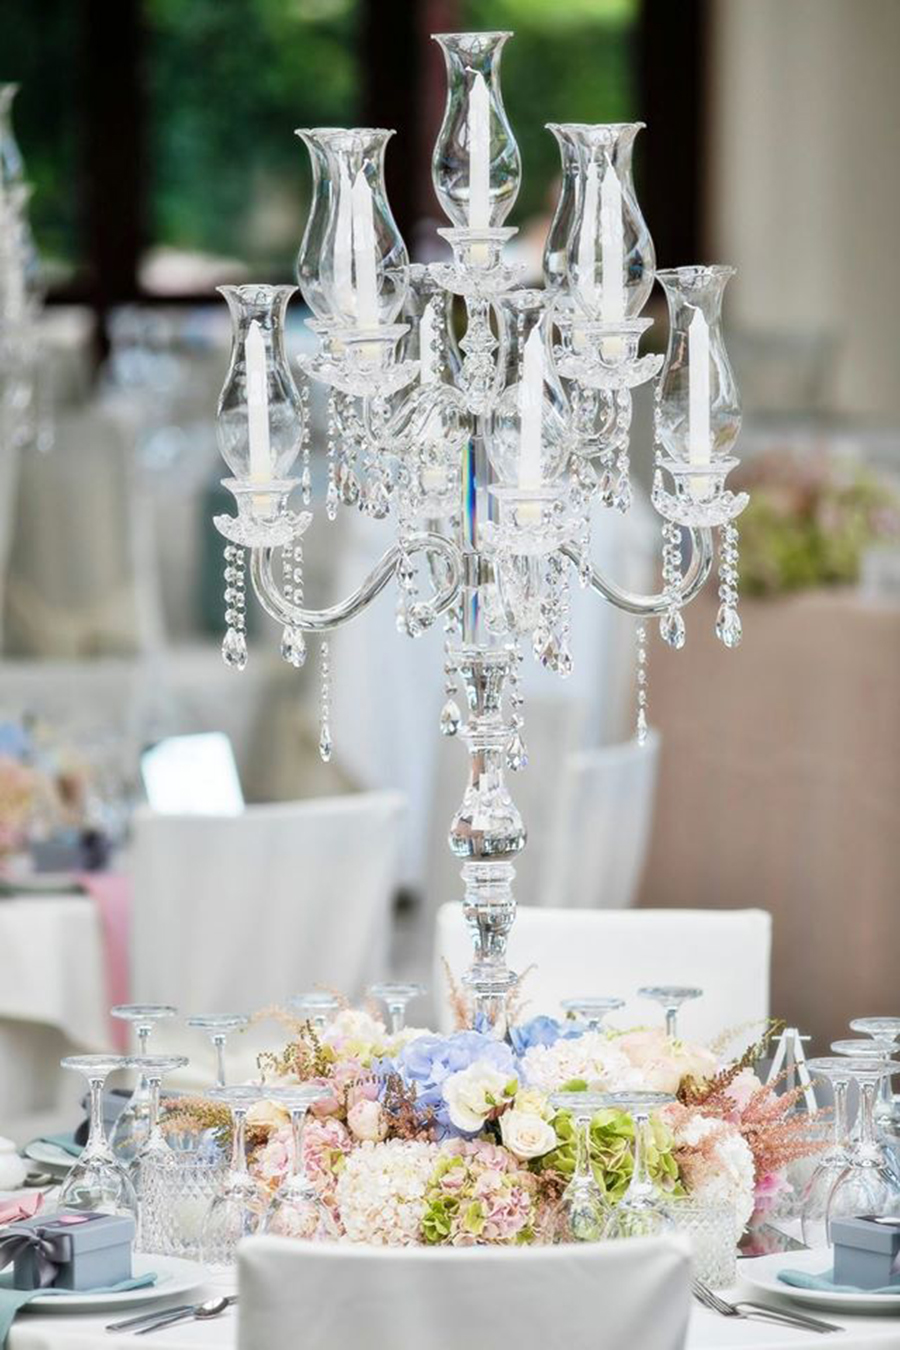 Calssy & elegant γάμος με παλ χρώματα